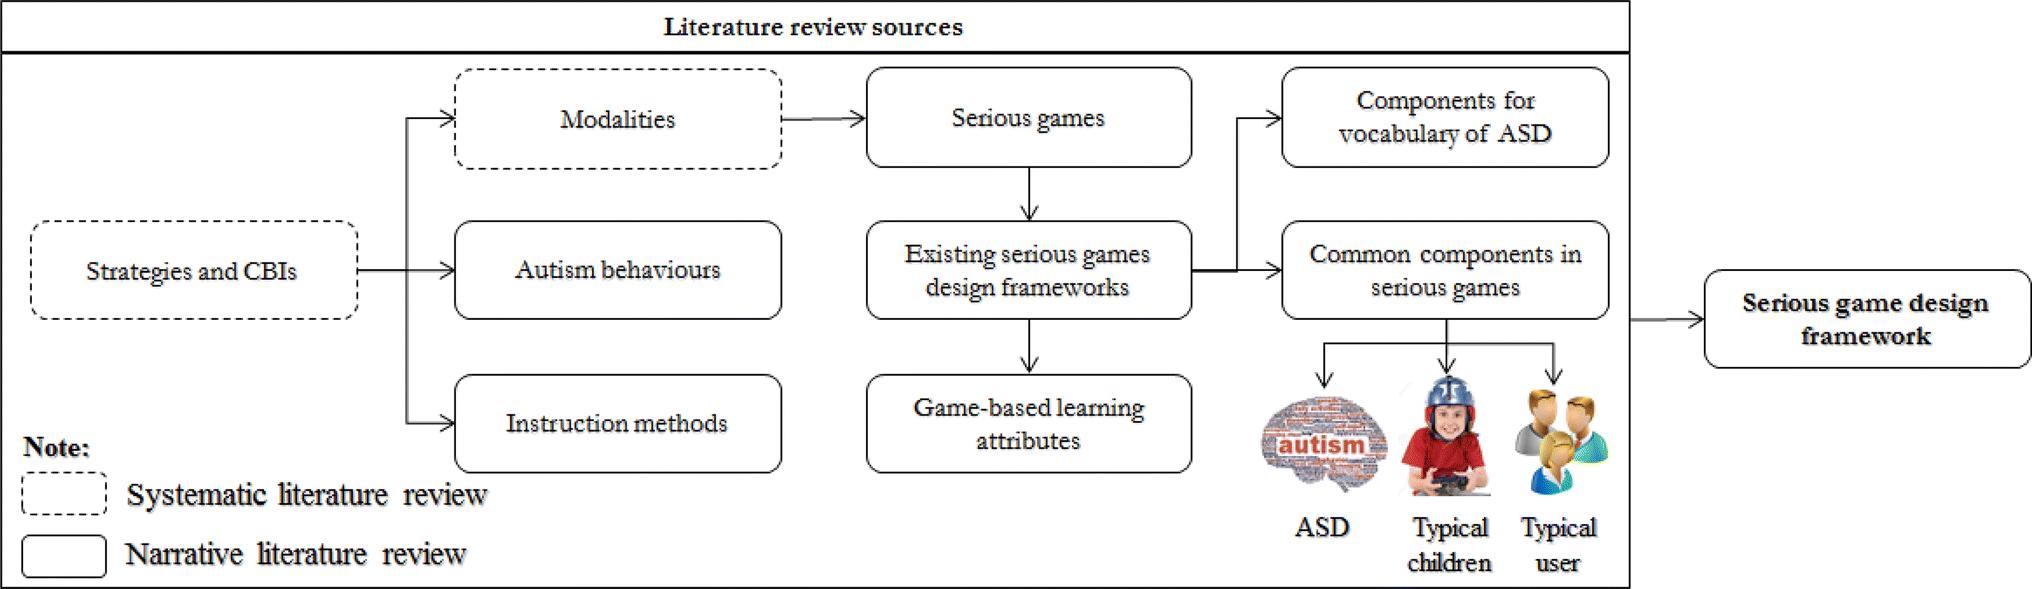 A framework to design vocabulary-based serious games for